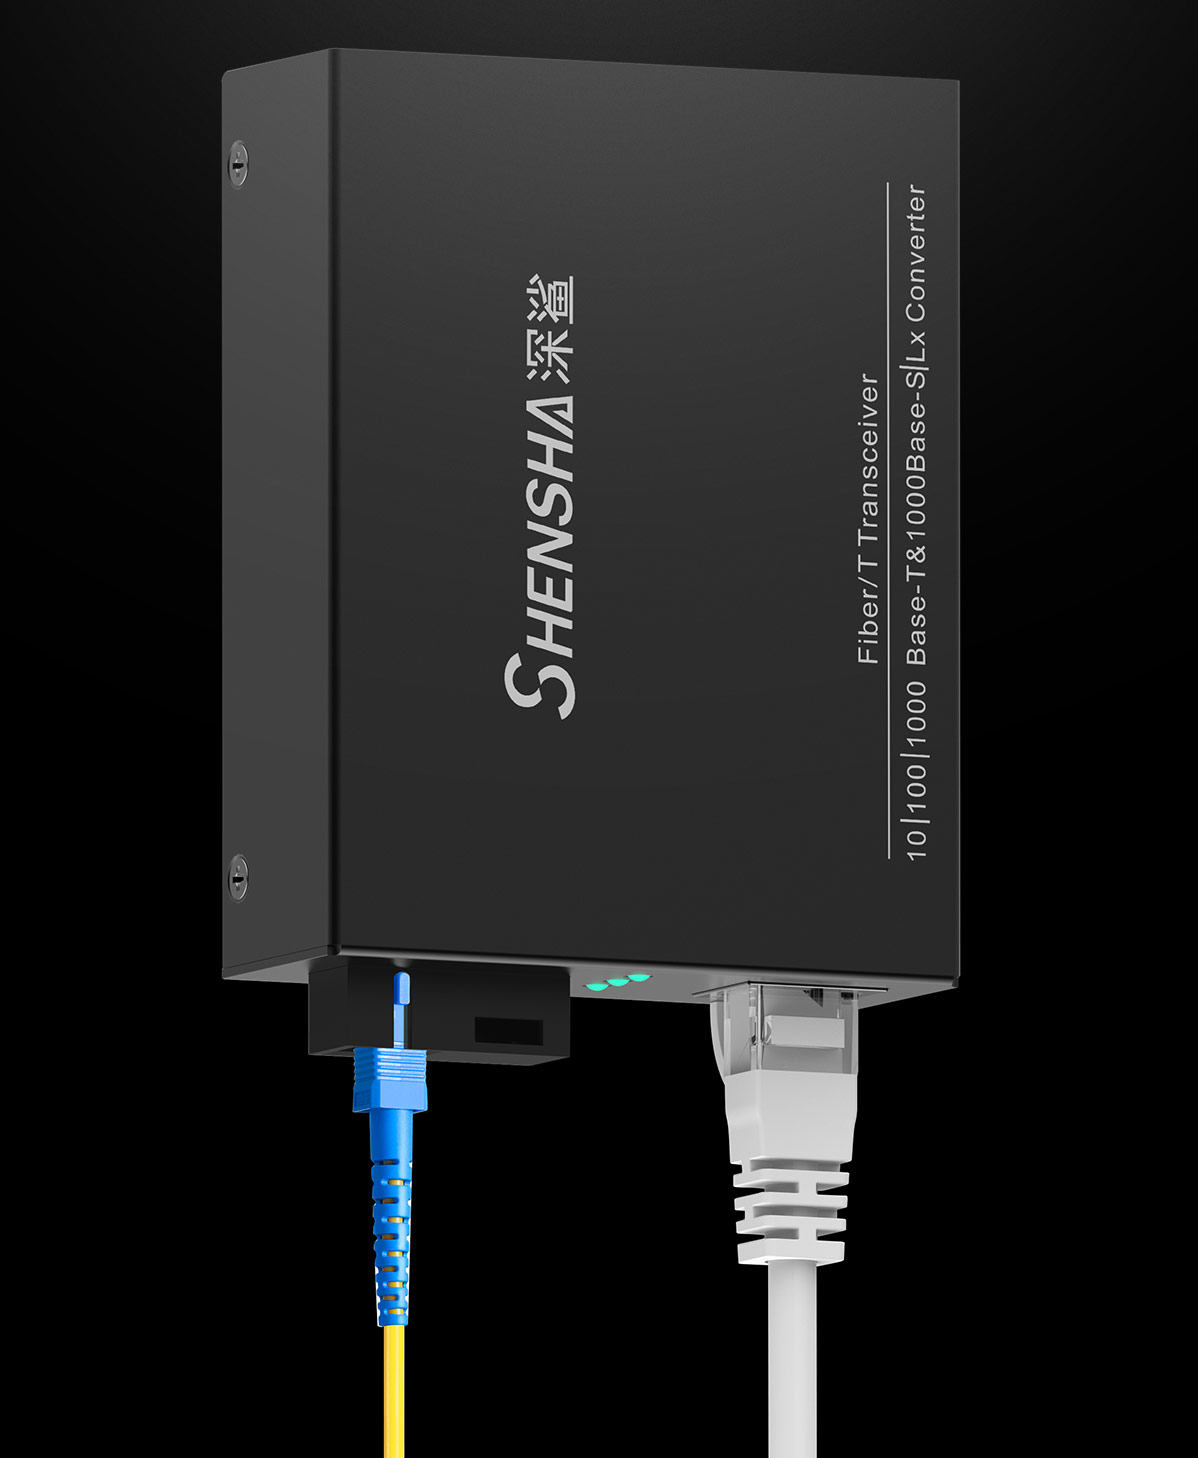 深鲨 光纤收发器 fiber transceiver 10/100/1000 Base-T & 1000Base-S/L*converter